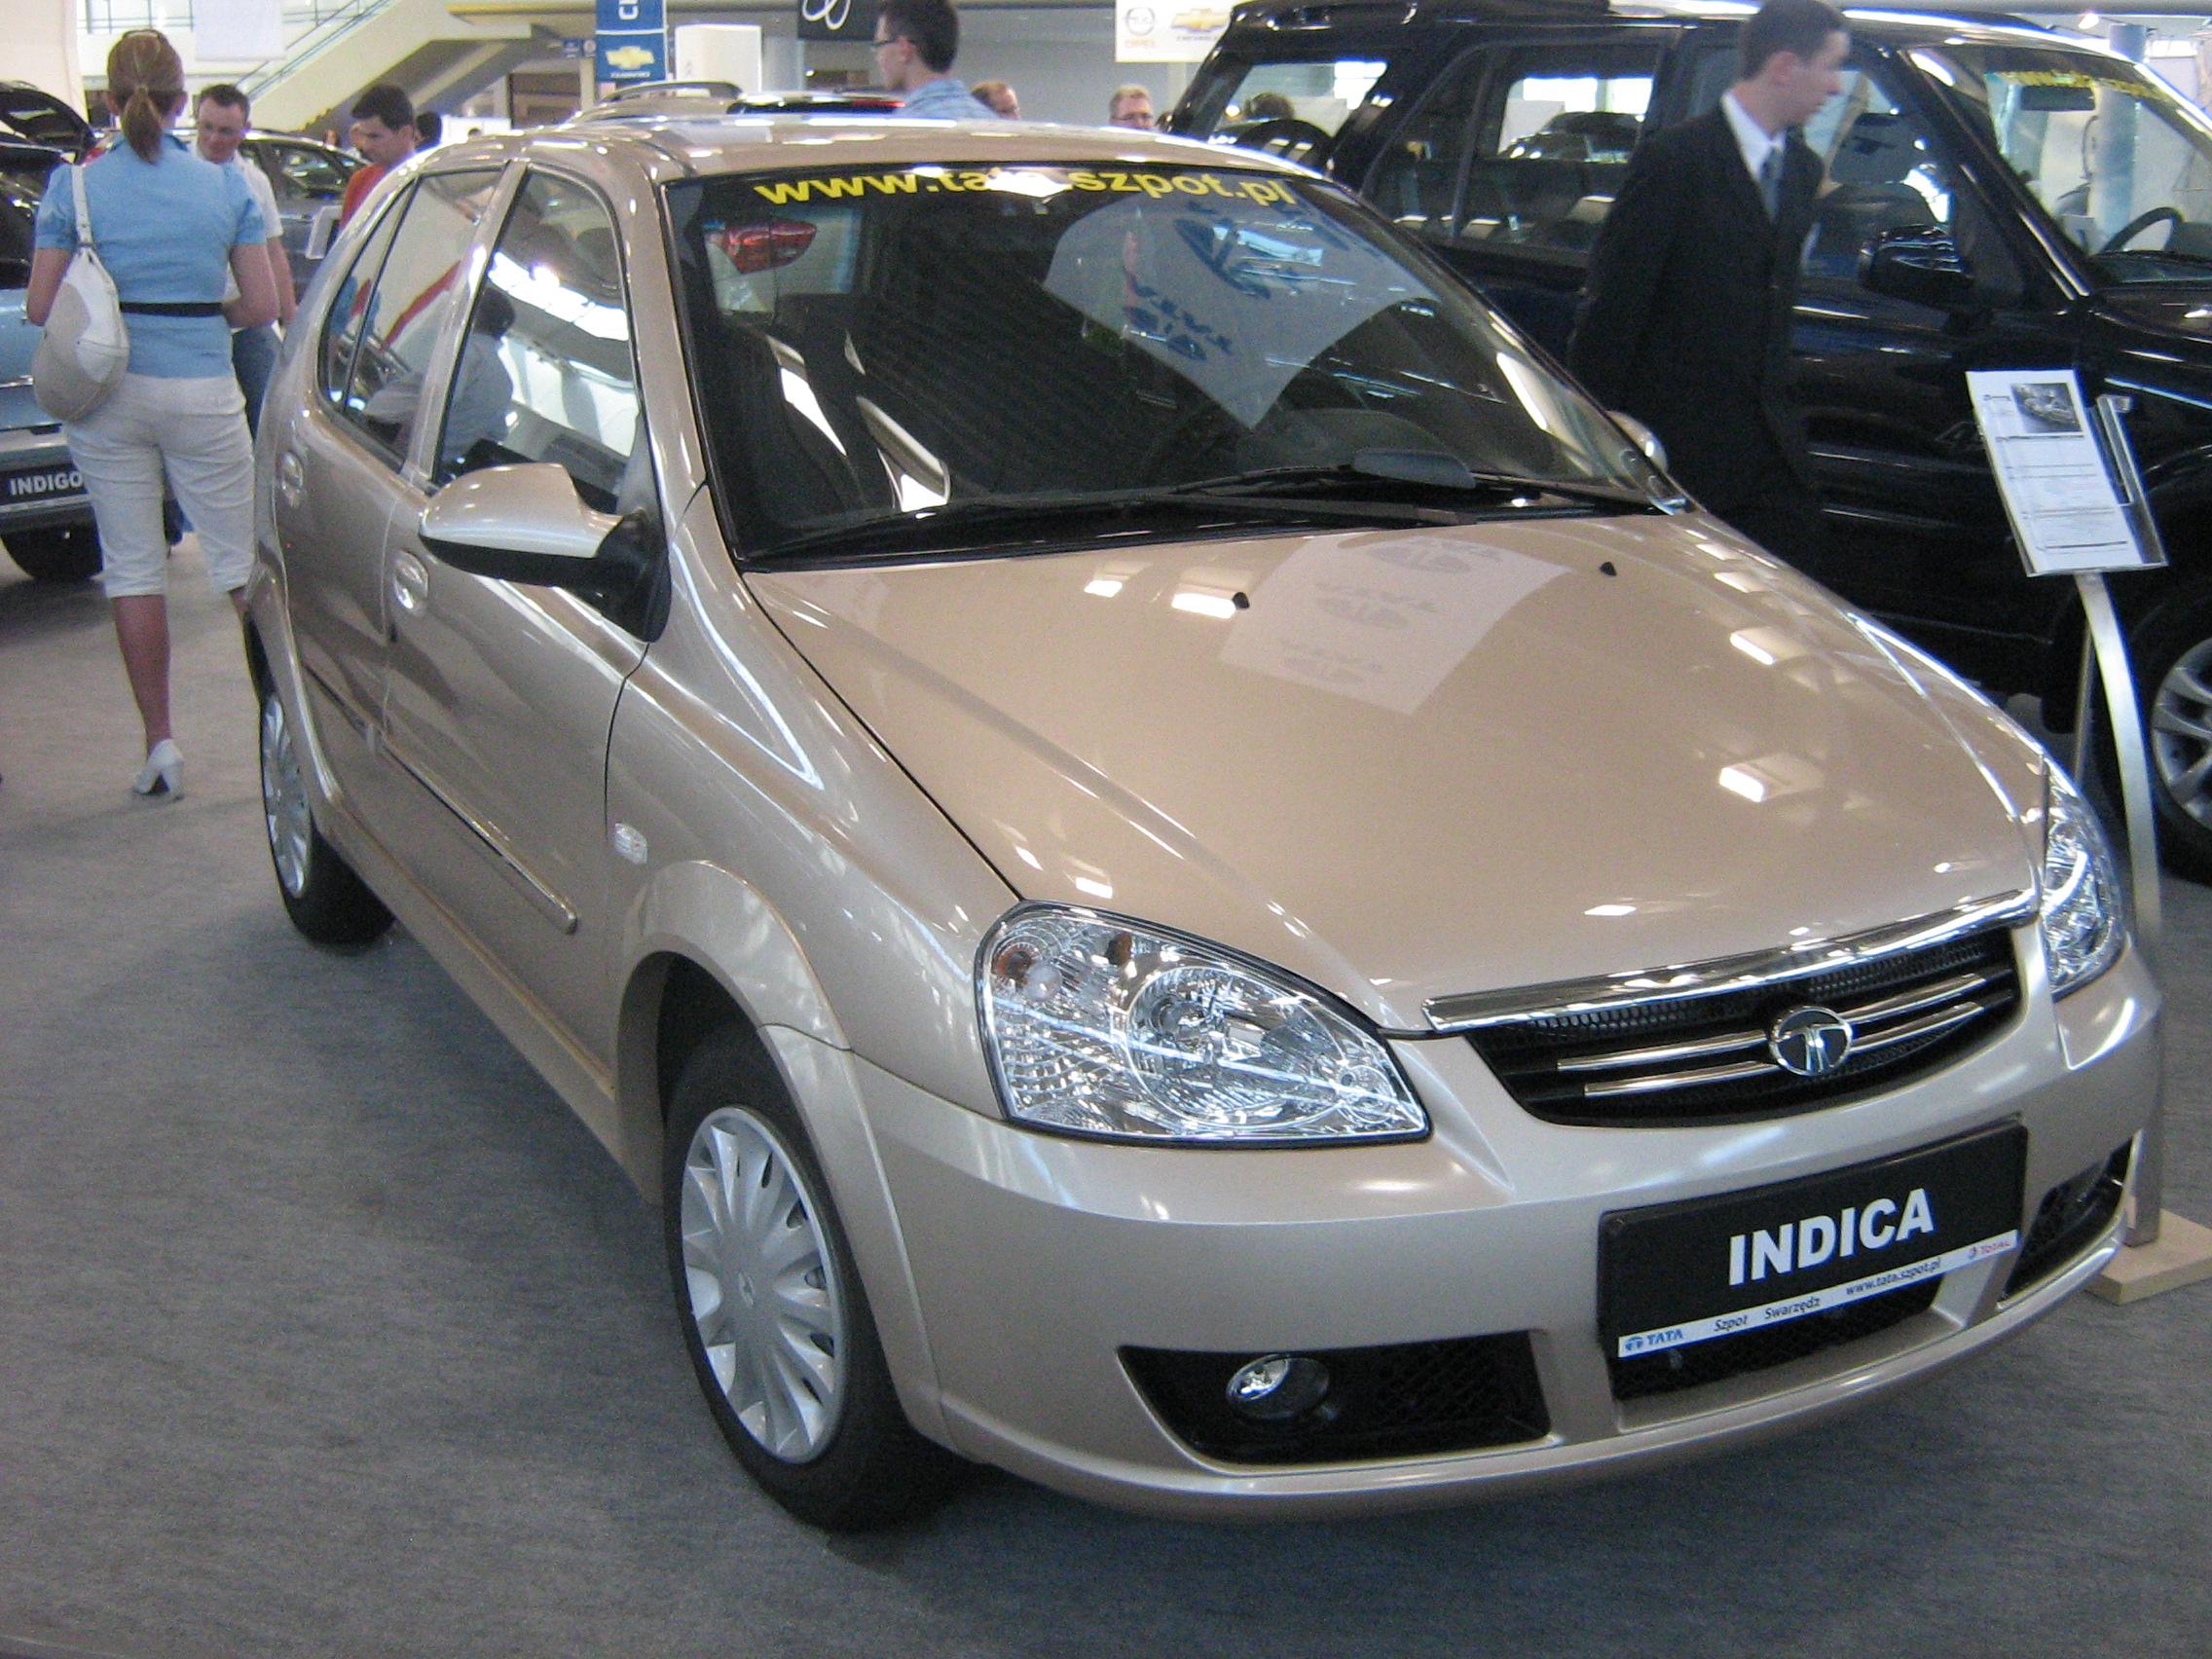 2009 Tata Indica